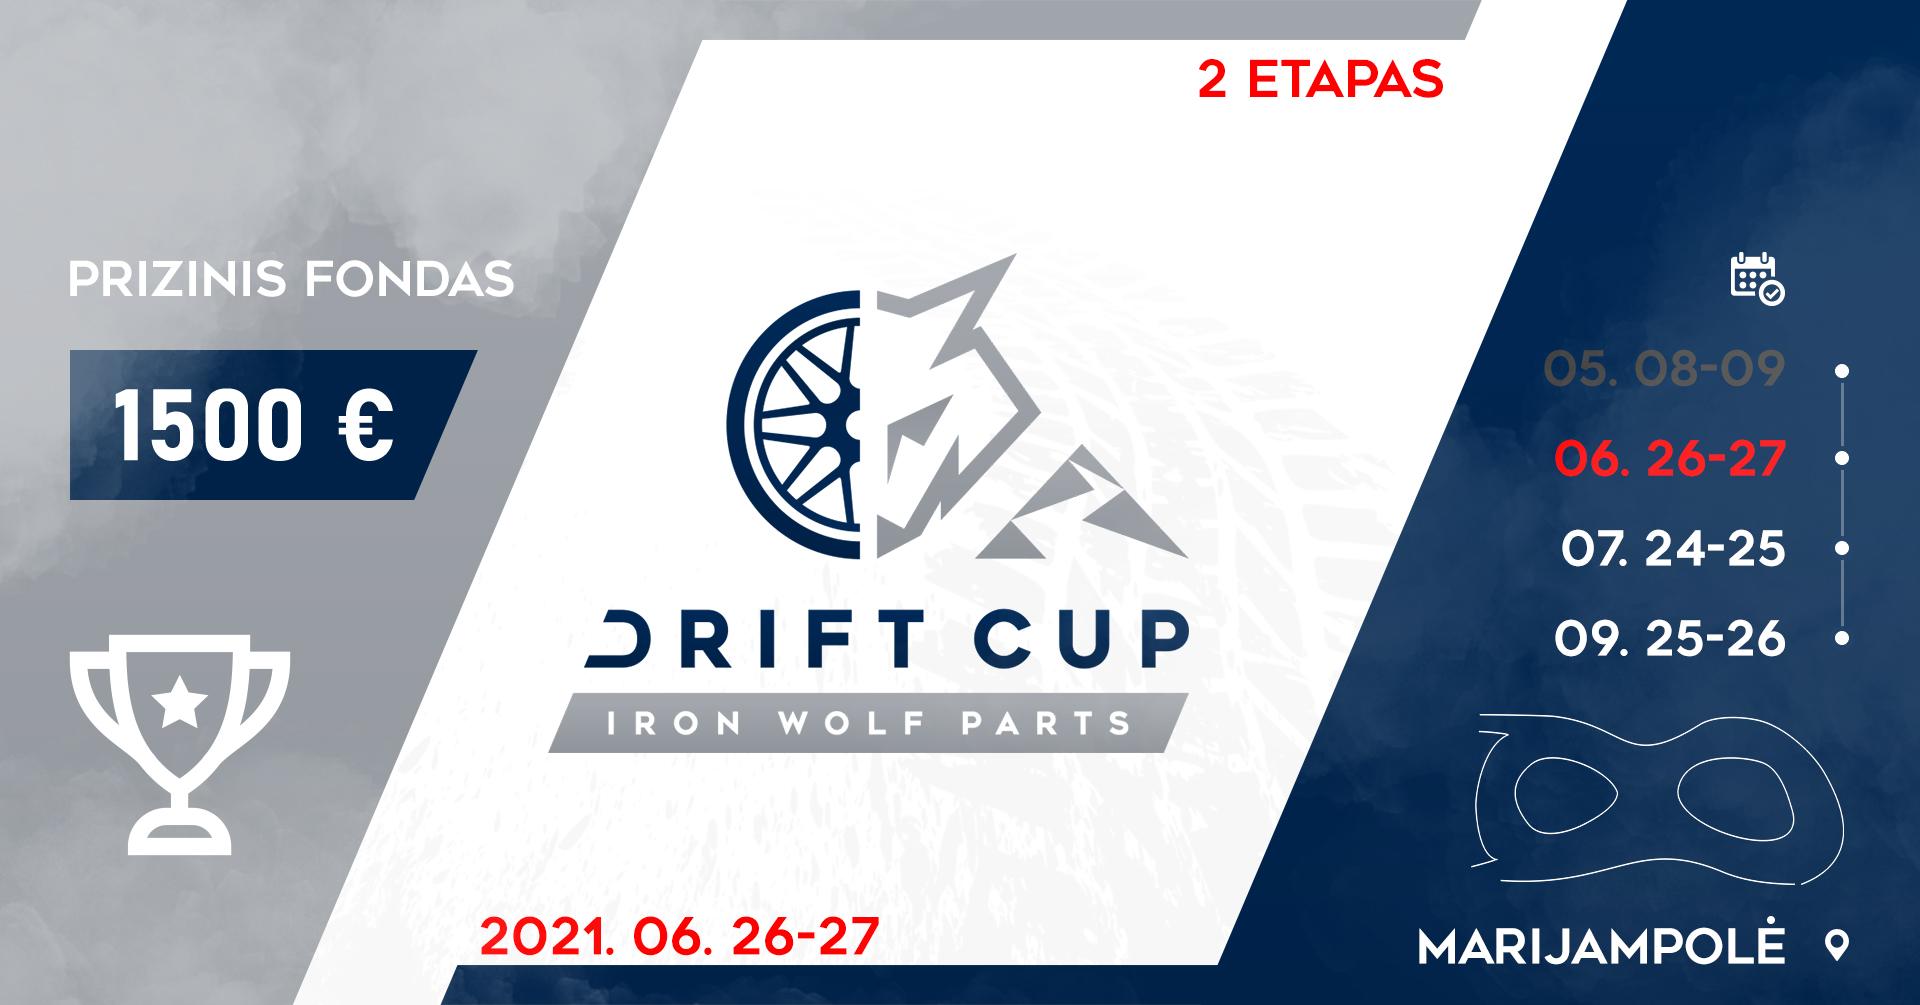 Iron Wolf Parts Drift Cup 2 Etapas